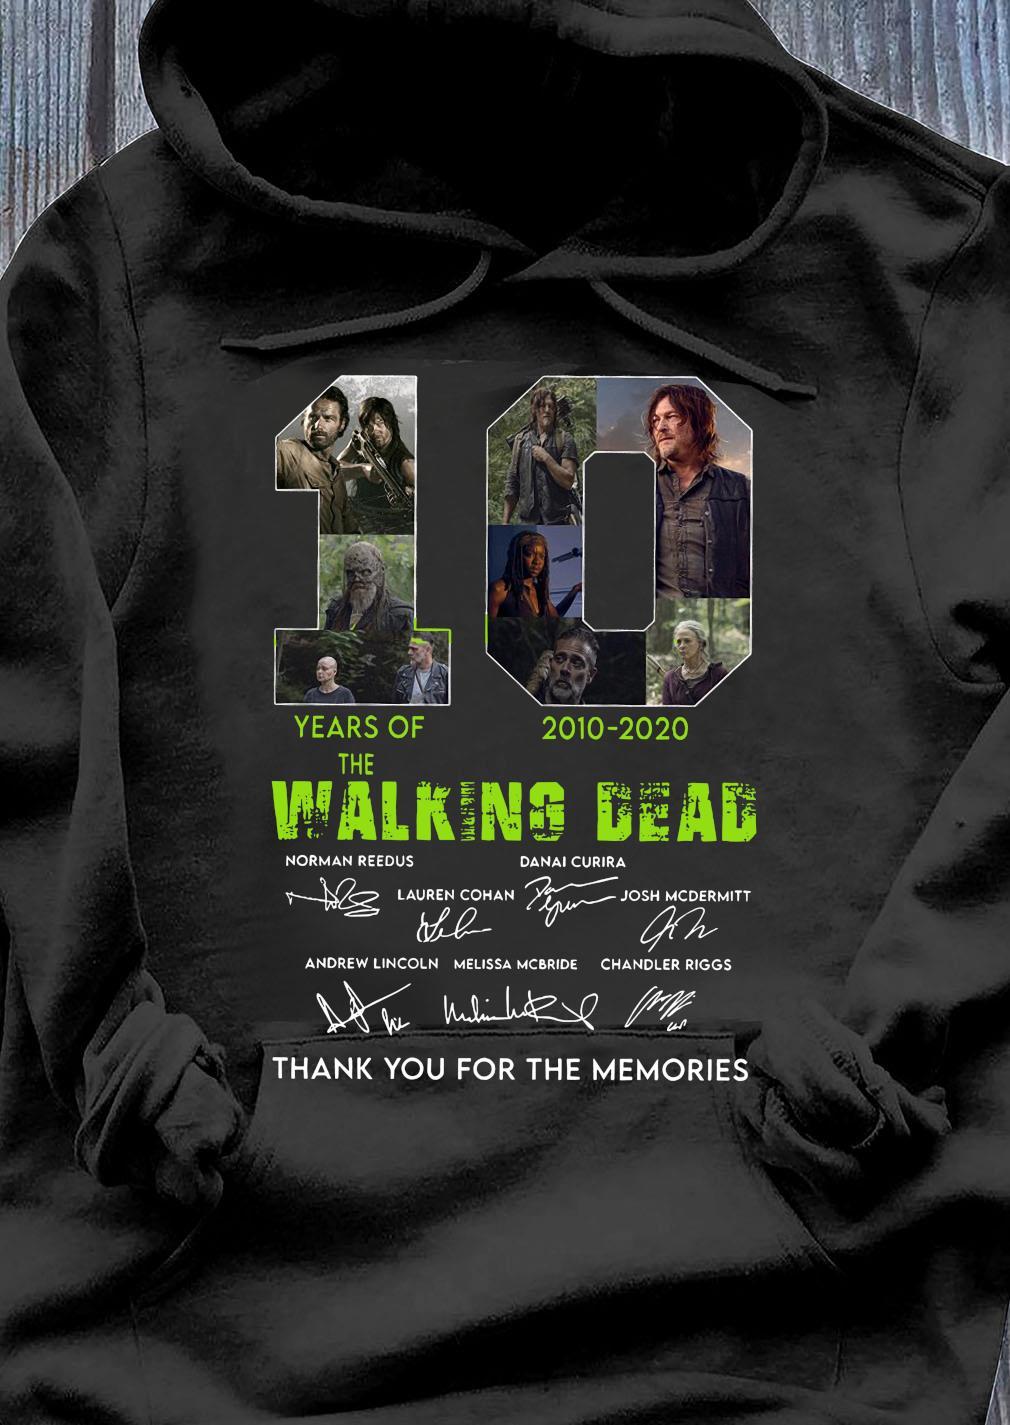 10 Years Of The Walking Dead 2010 2020 Anniversary Shirt Hoodie